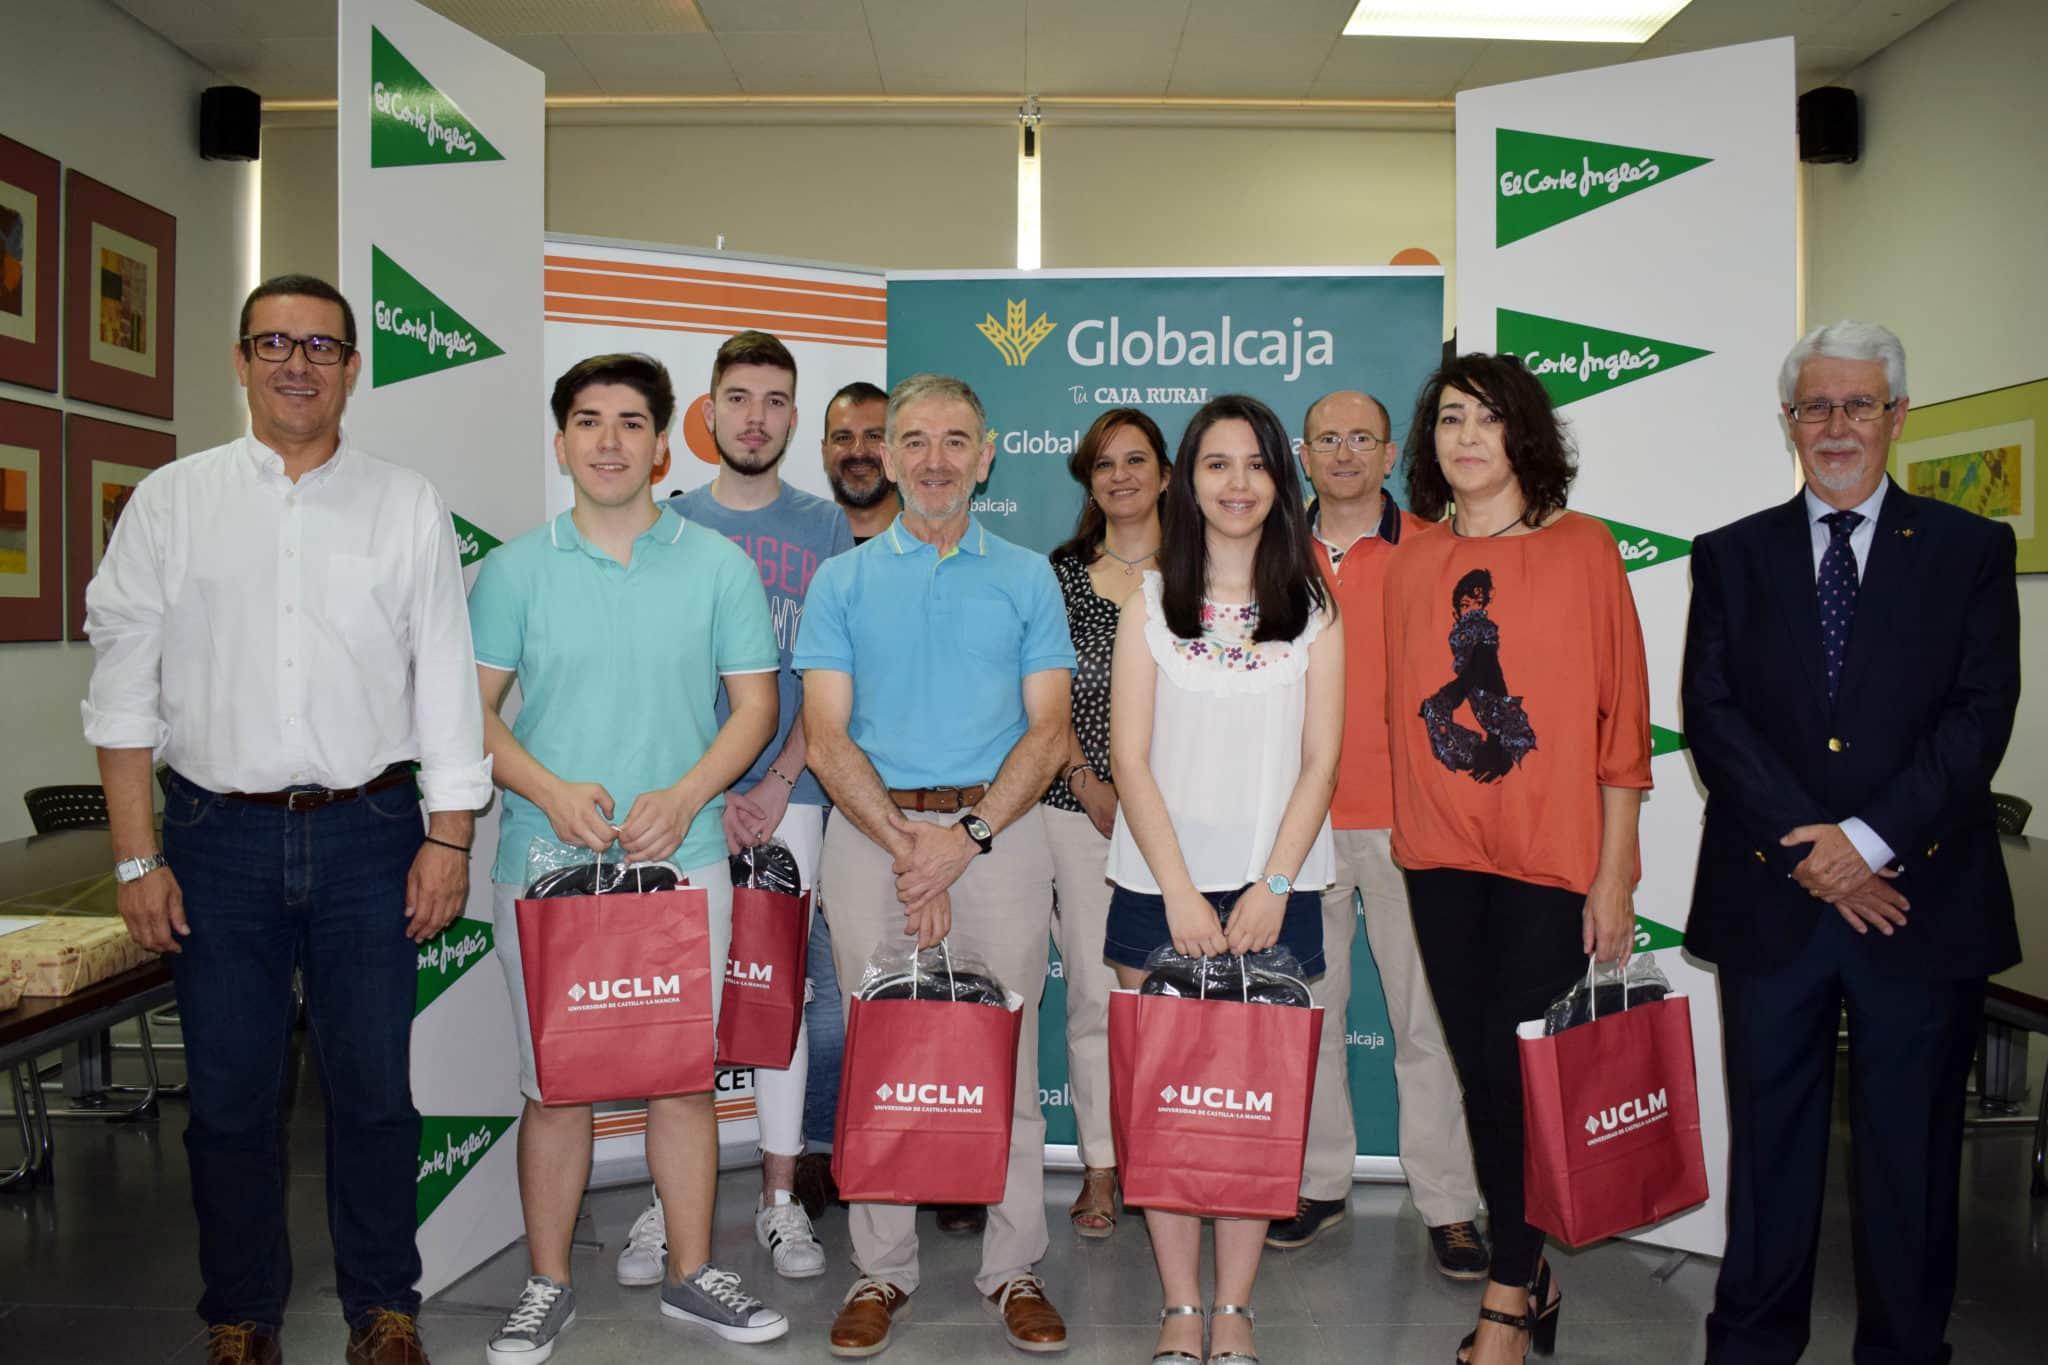 https://blog.globalcaja.es/wp-content/uploads/2018/07/Premios_olimpiada_economia.jpg